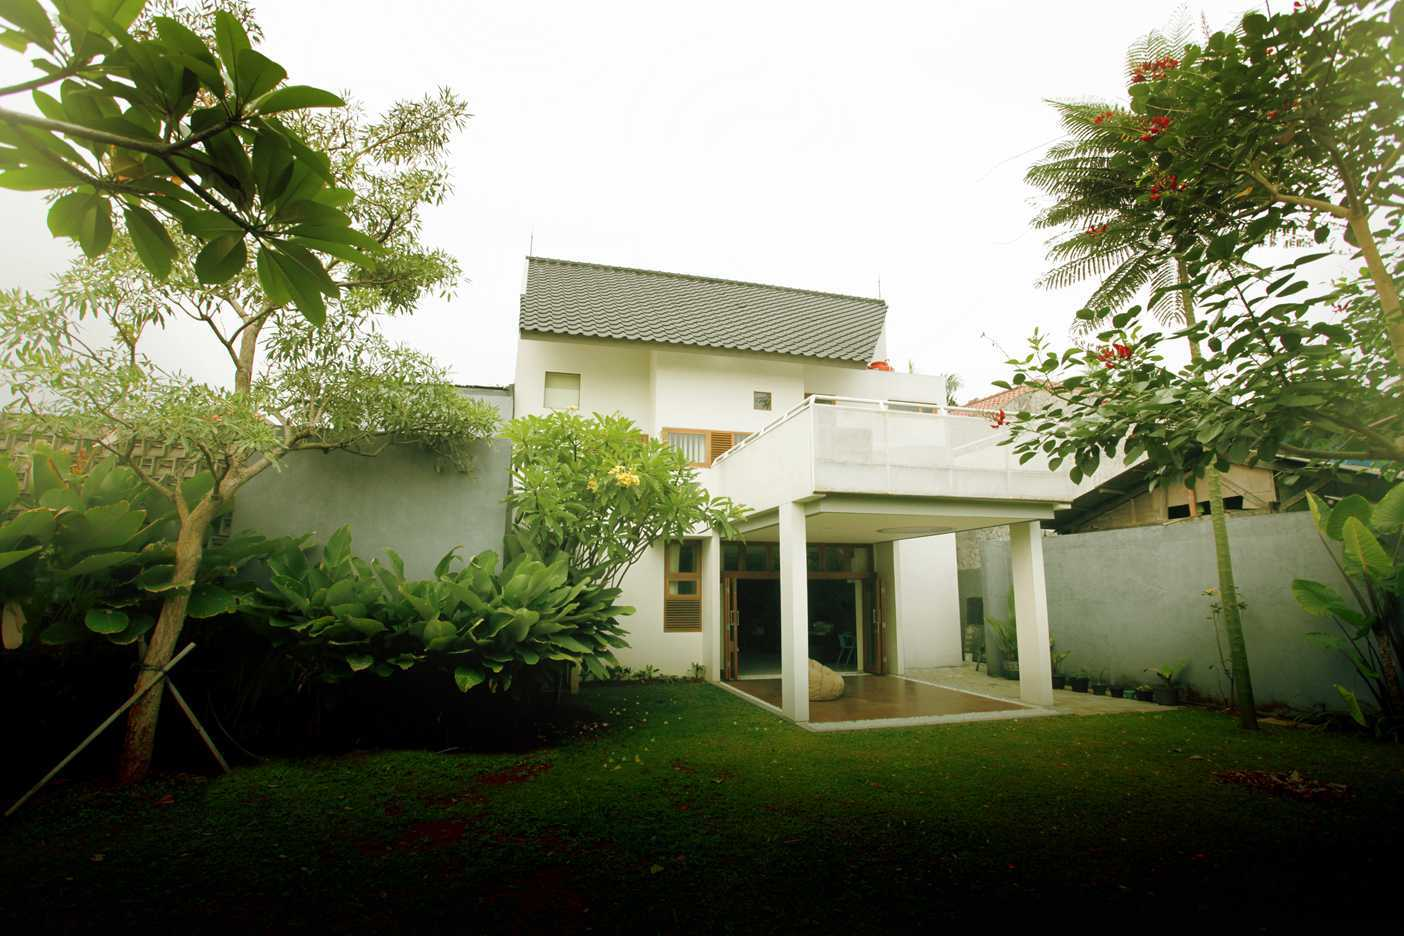 Armeyn Ilyas Doctor House Kelapa Dua Wetan, Ciracas, East Jakarta City, Jakarta, Indonesia Jakarta Backyard Modern  17737